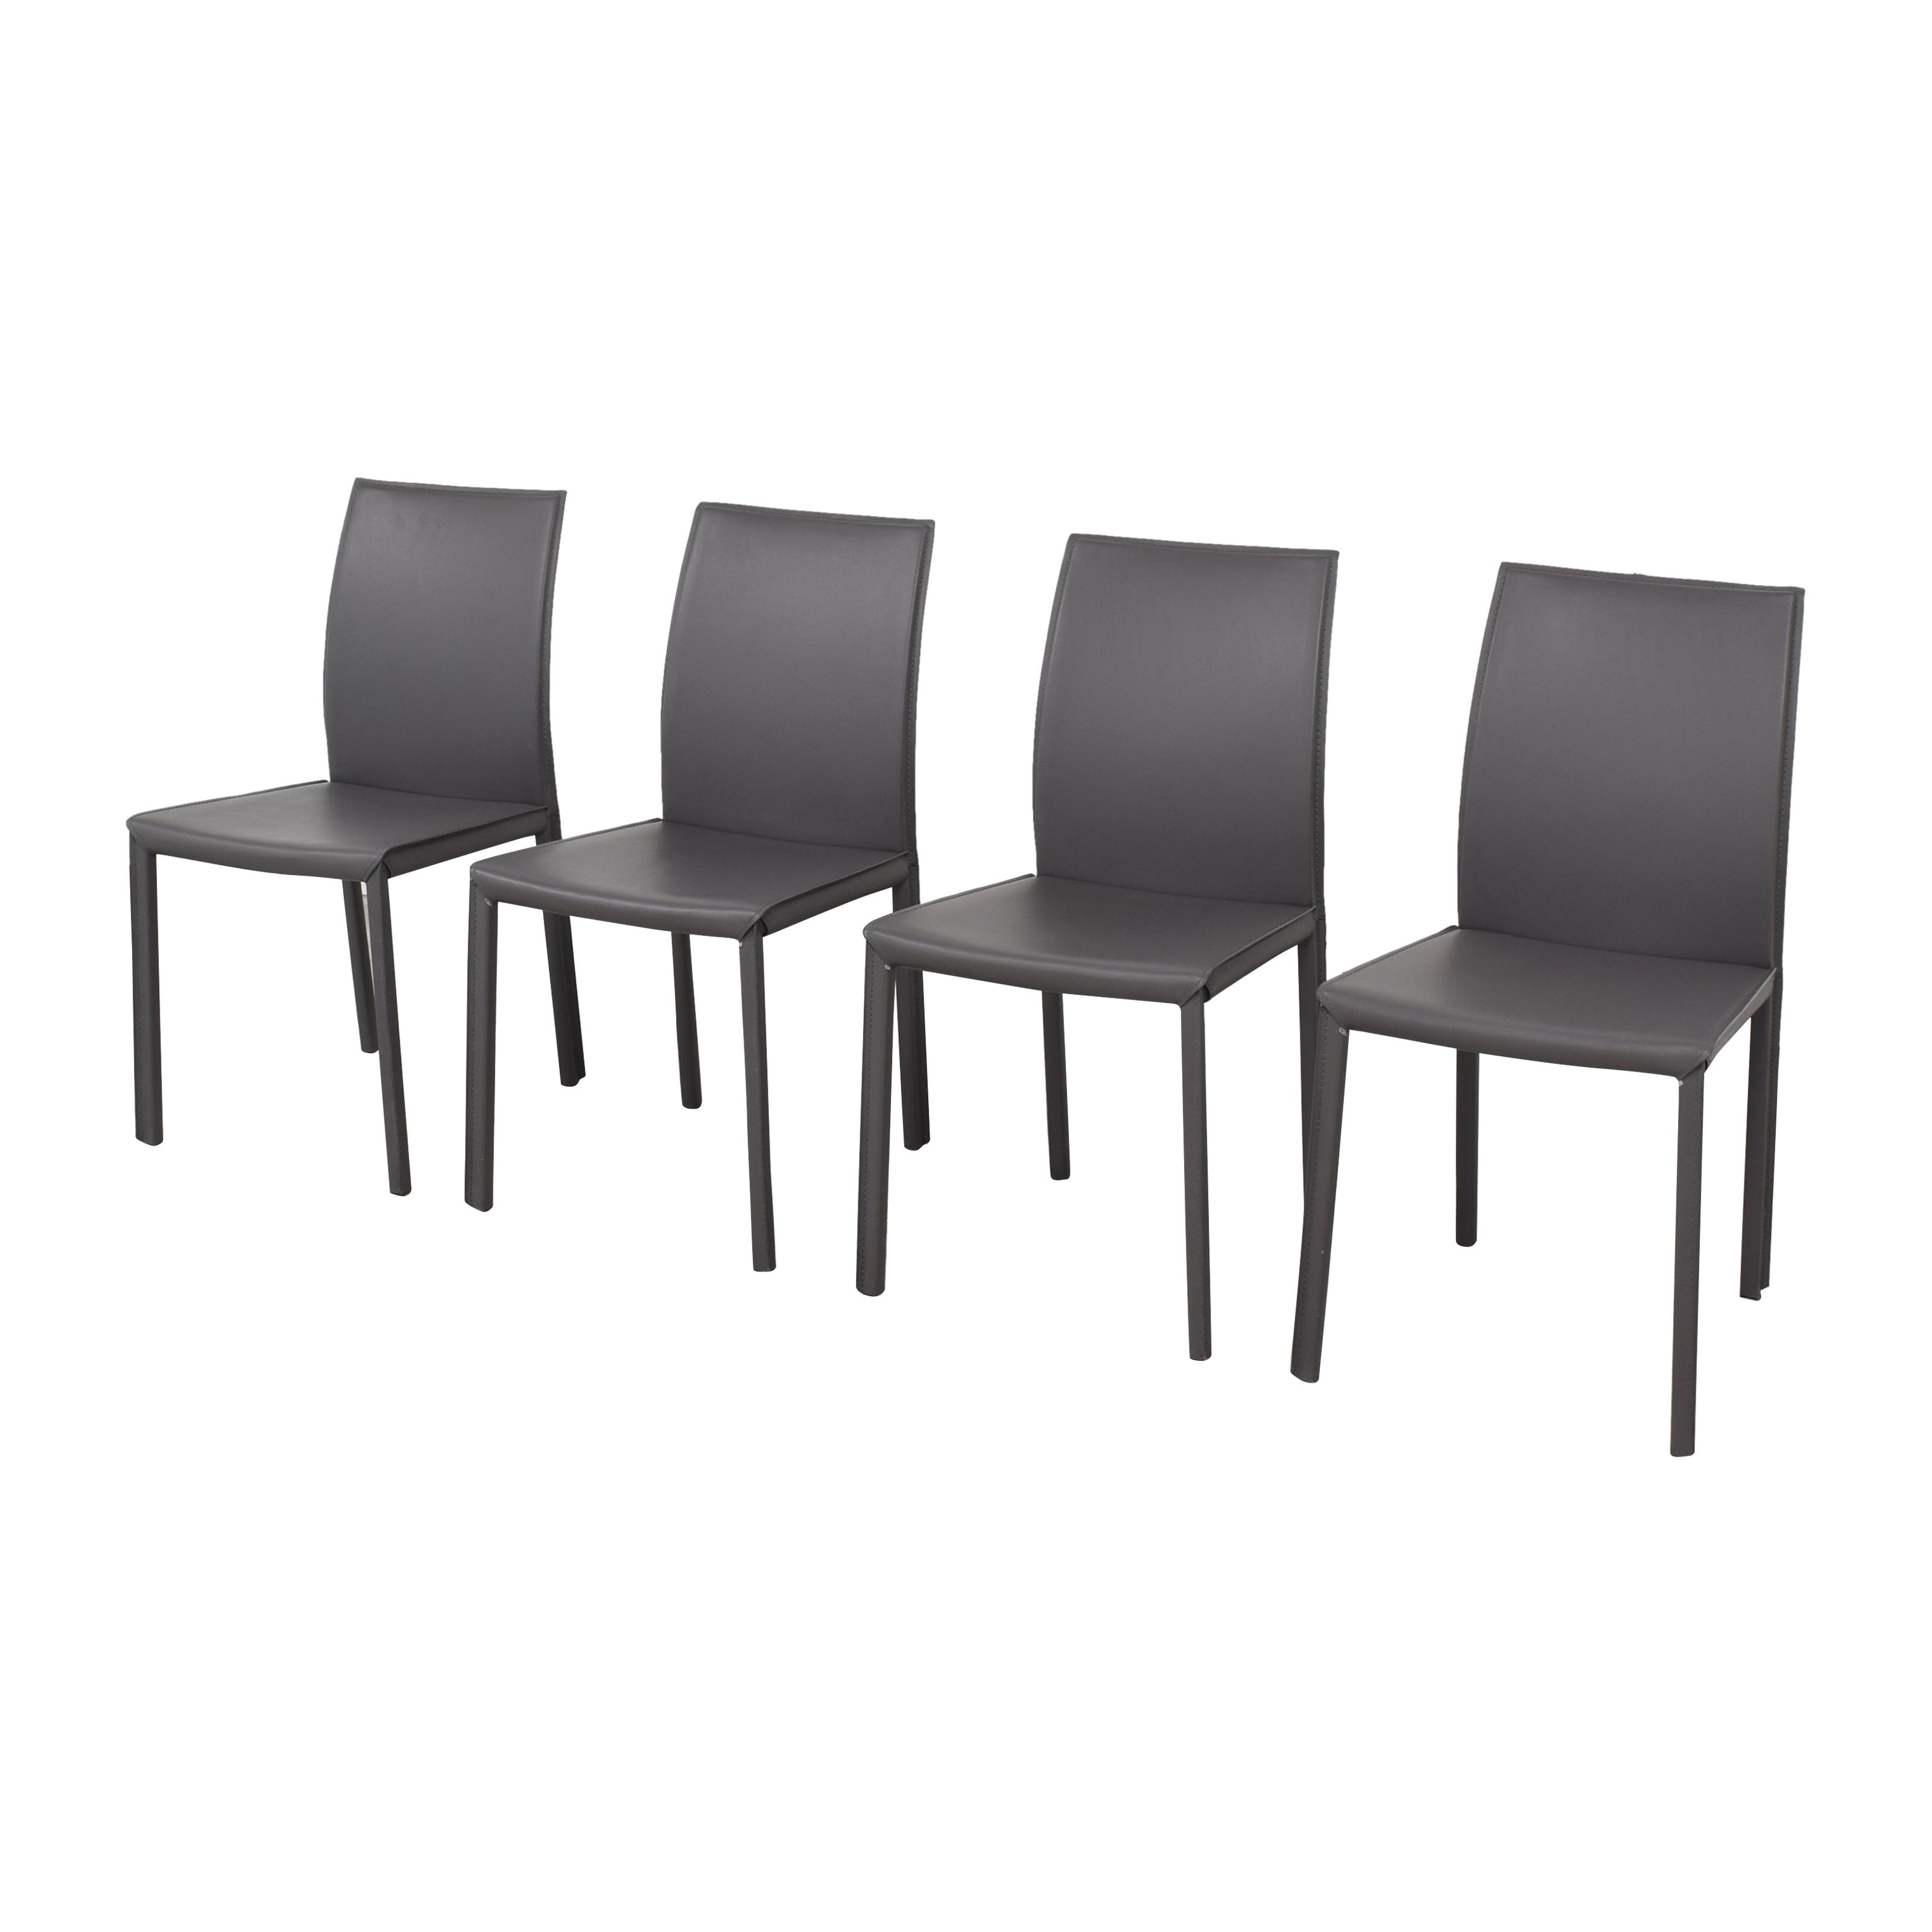 BoConcept BoConcept Zarra Dining Chairs ma